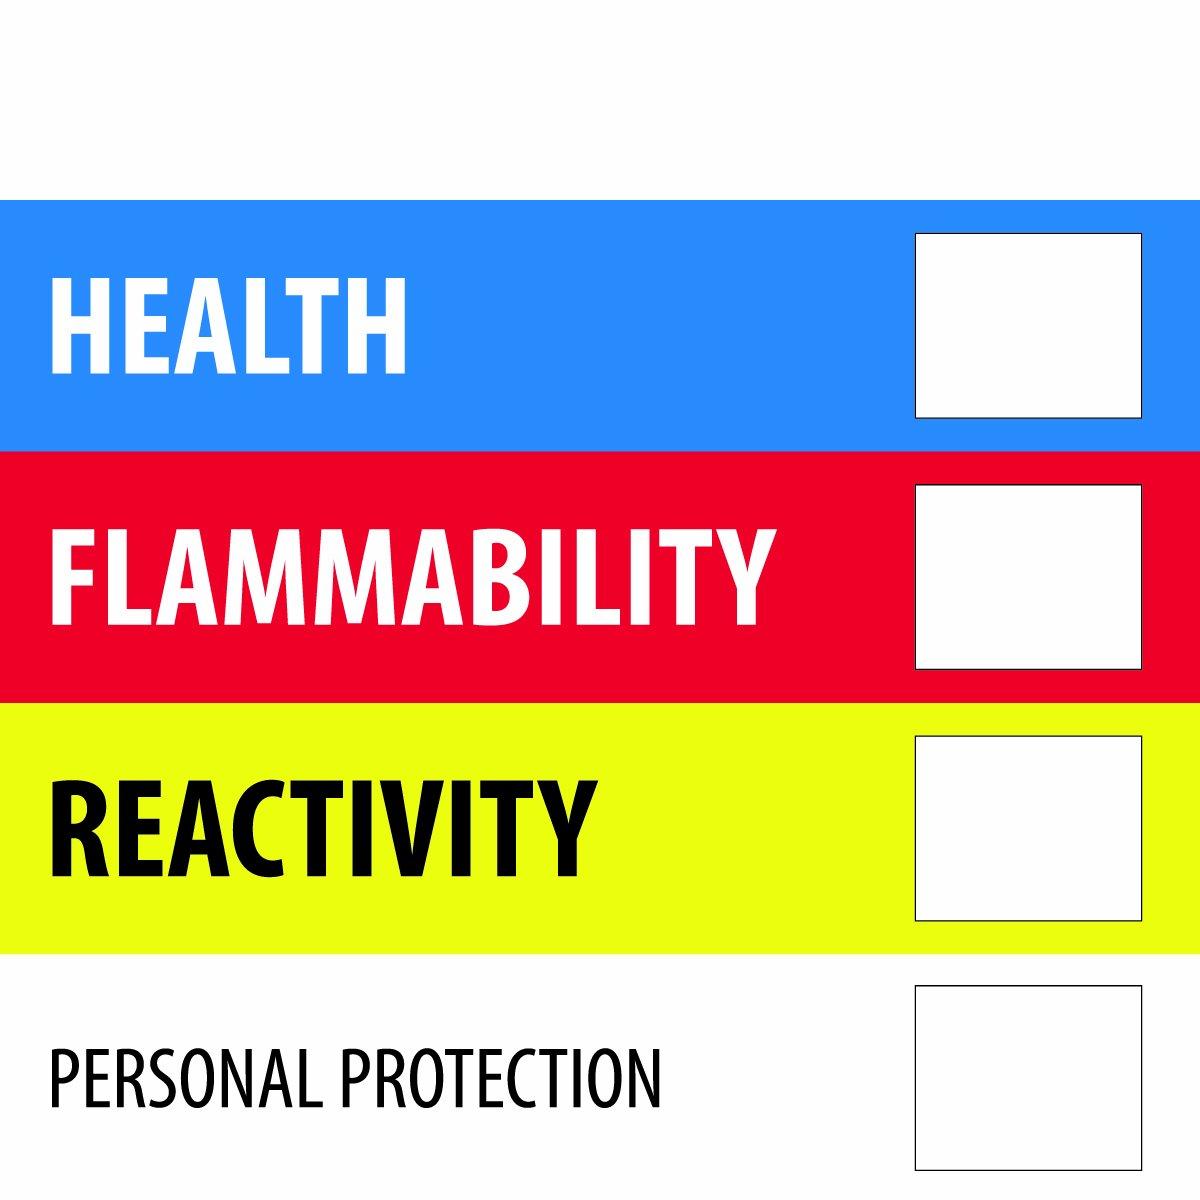 DL1286 Tape Logic Instructions Label Blue//Red//Yellow 4 L x 4 W LegendHealth Flammability Reactivity